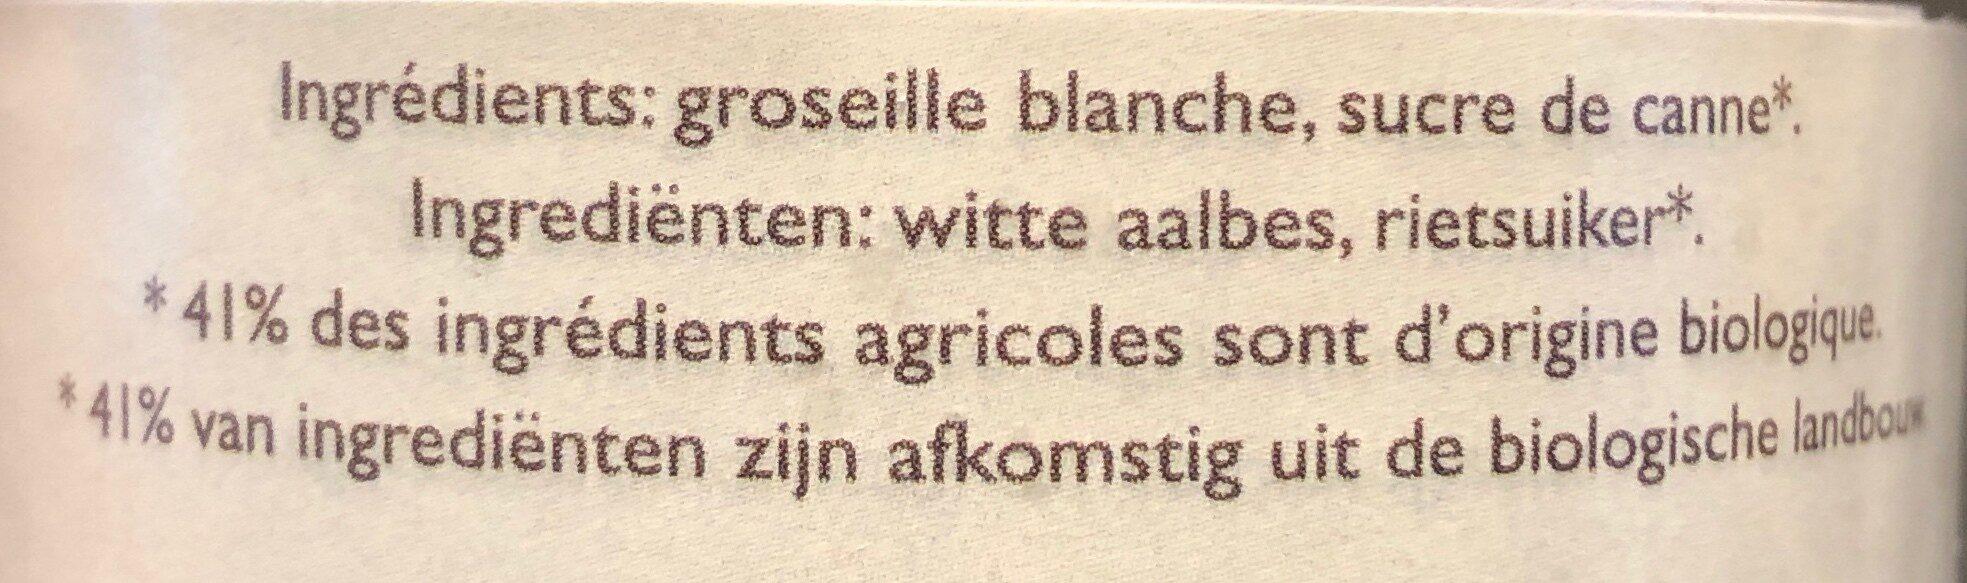 Confiture de groseilles blanches - Ingrediënten - fr